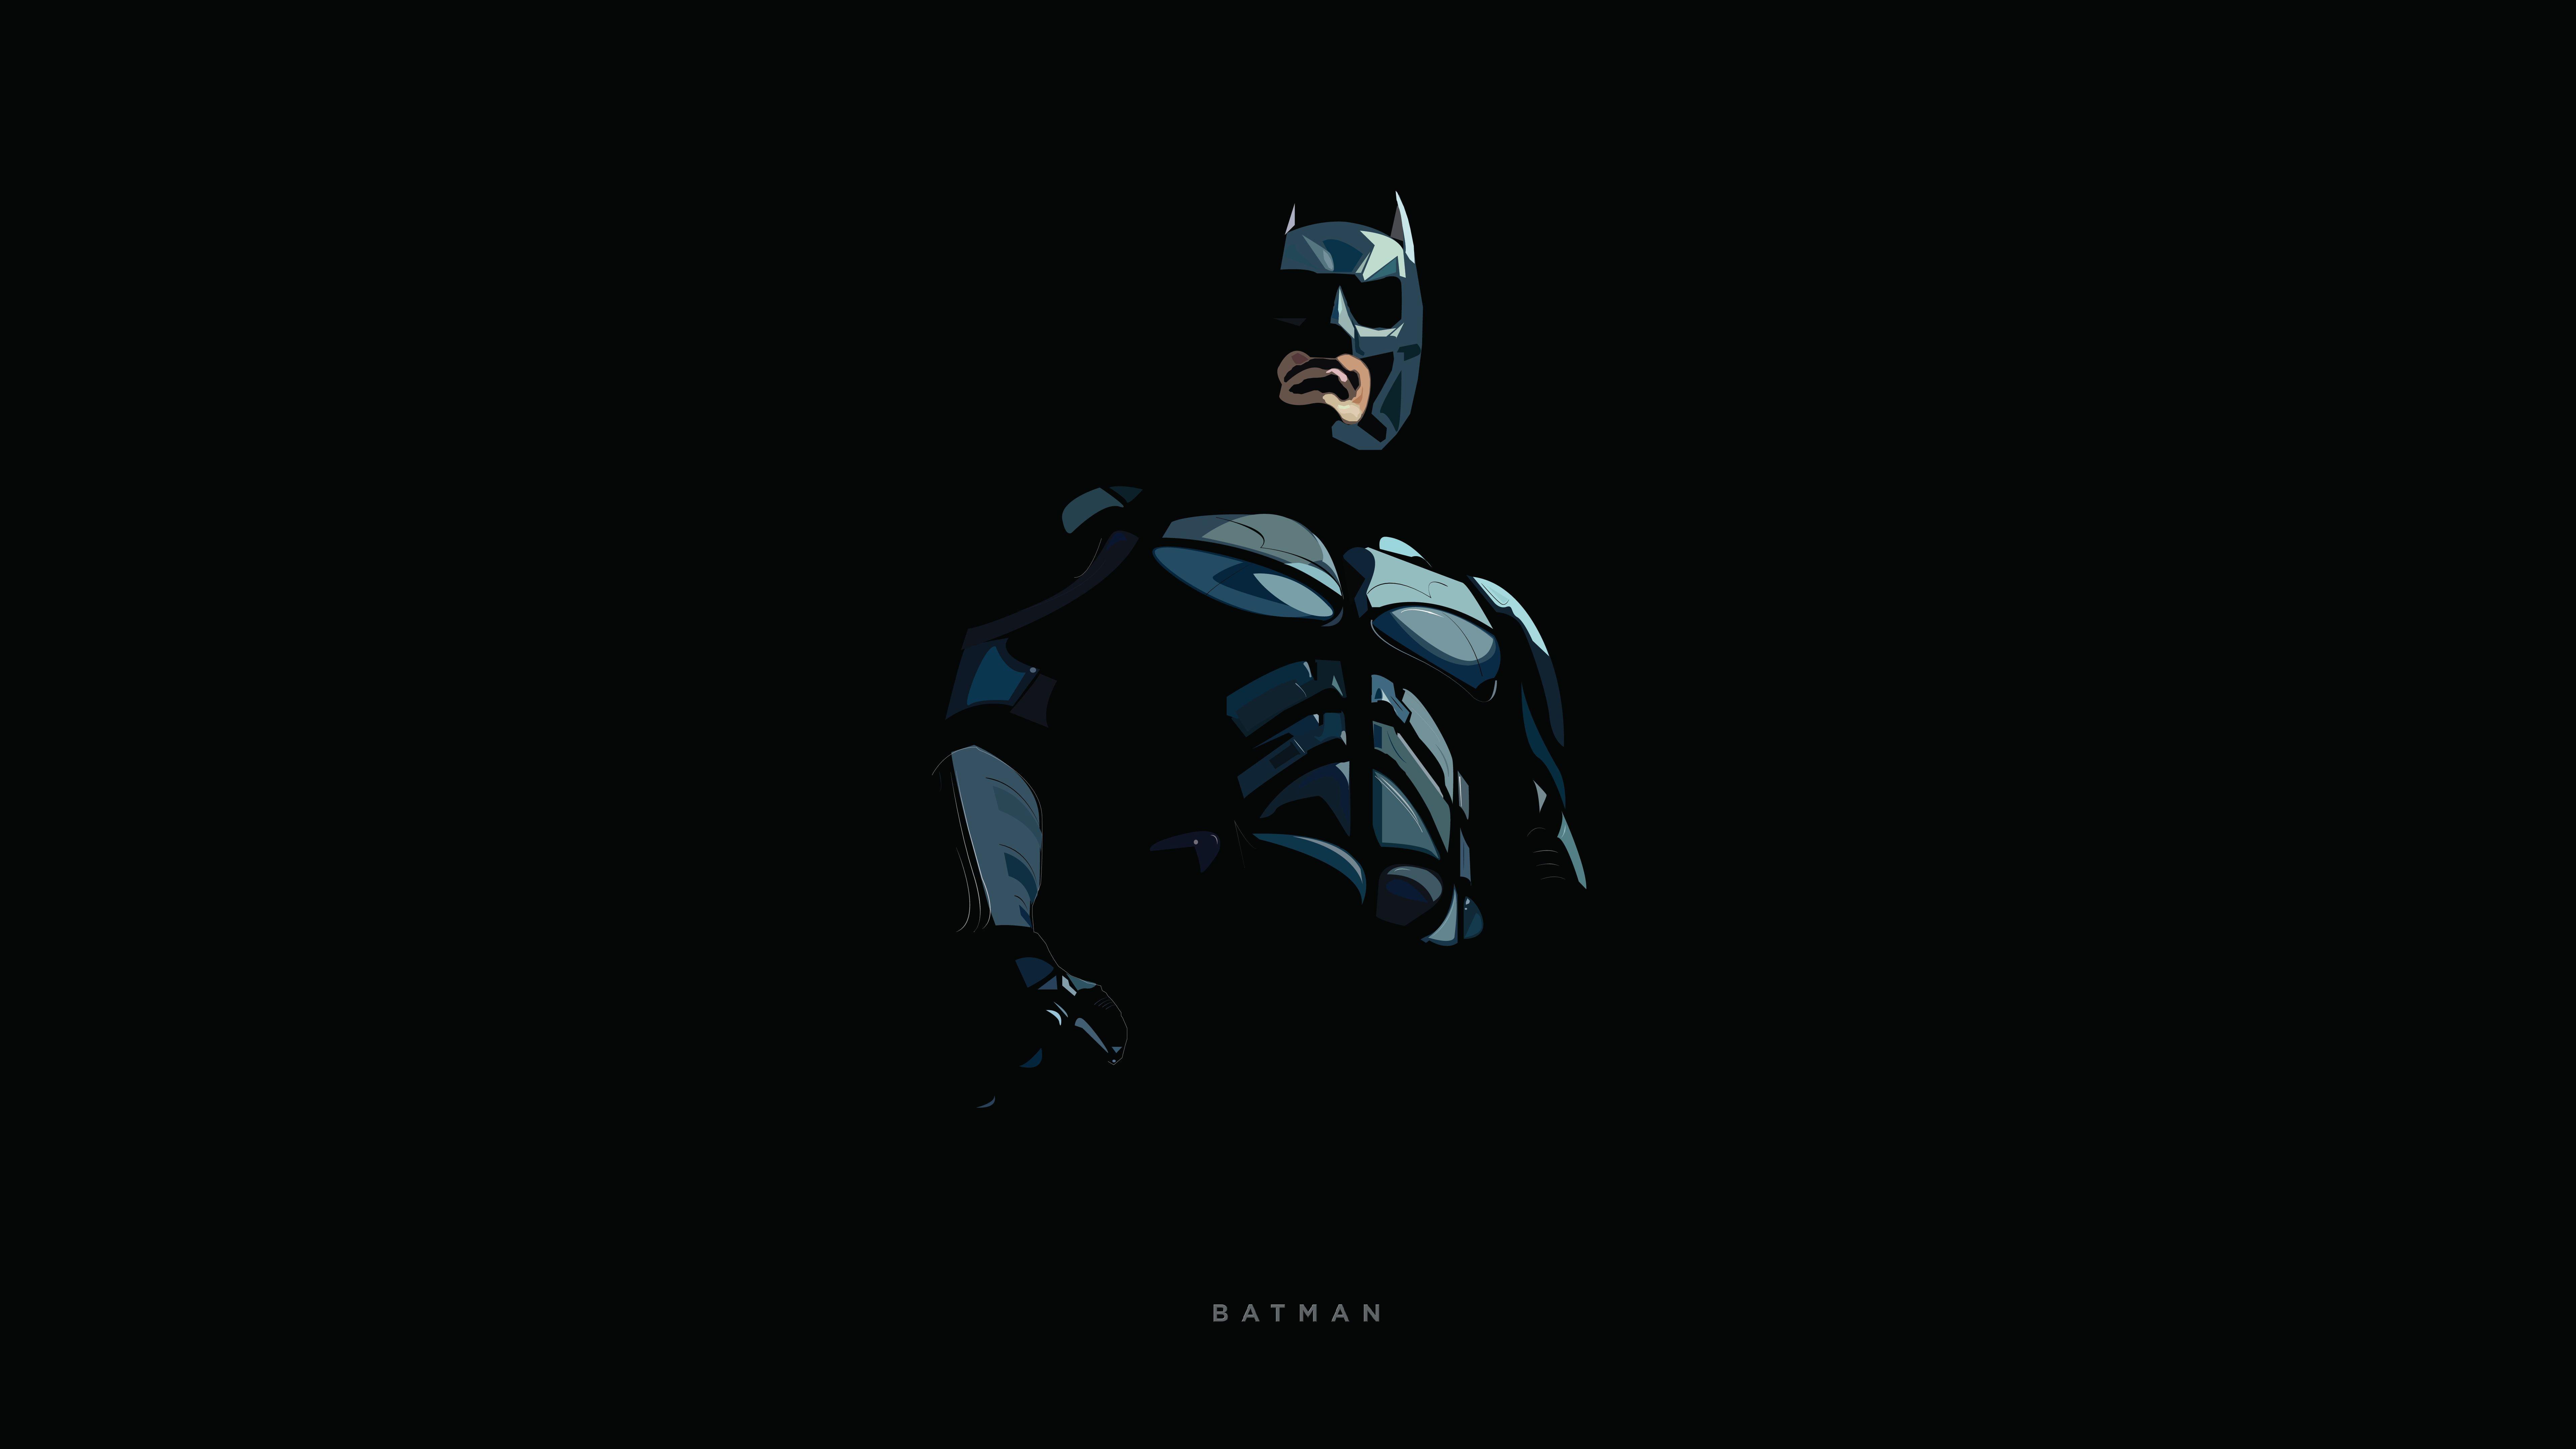 4k Superheroes Black 8k Dc Comics Minimal Batman Dark Background 8k Wallpaper Hdwallpap In 2020 Batman Wallpaper Superhero Wallpaper Dark Background Wallpaper